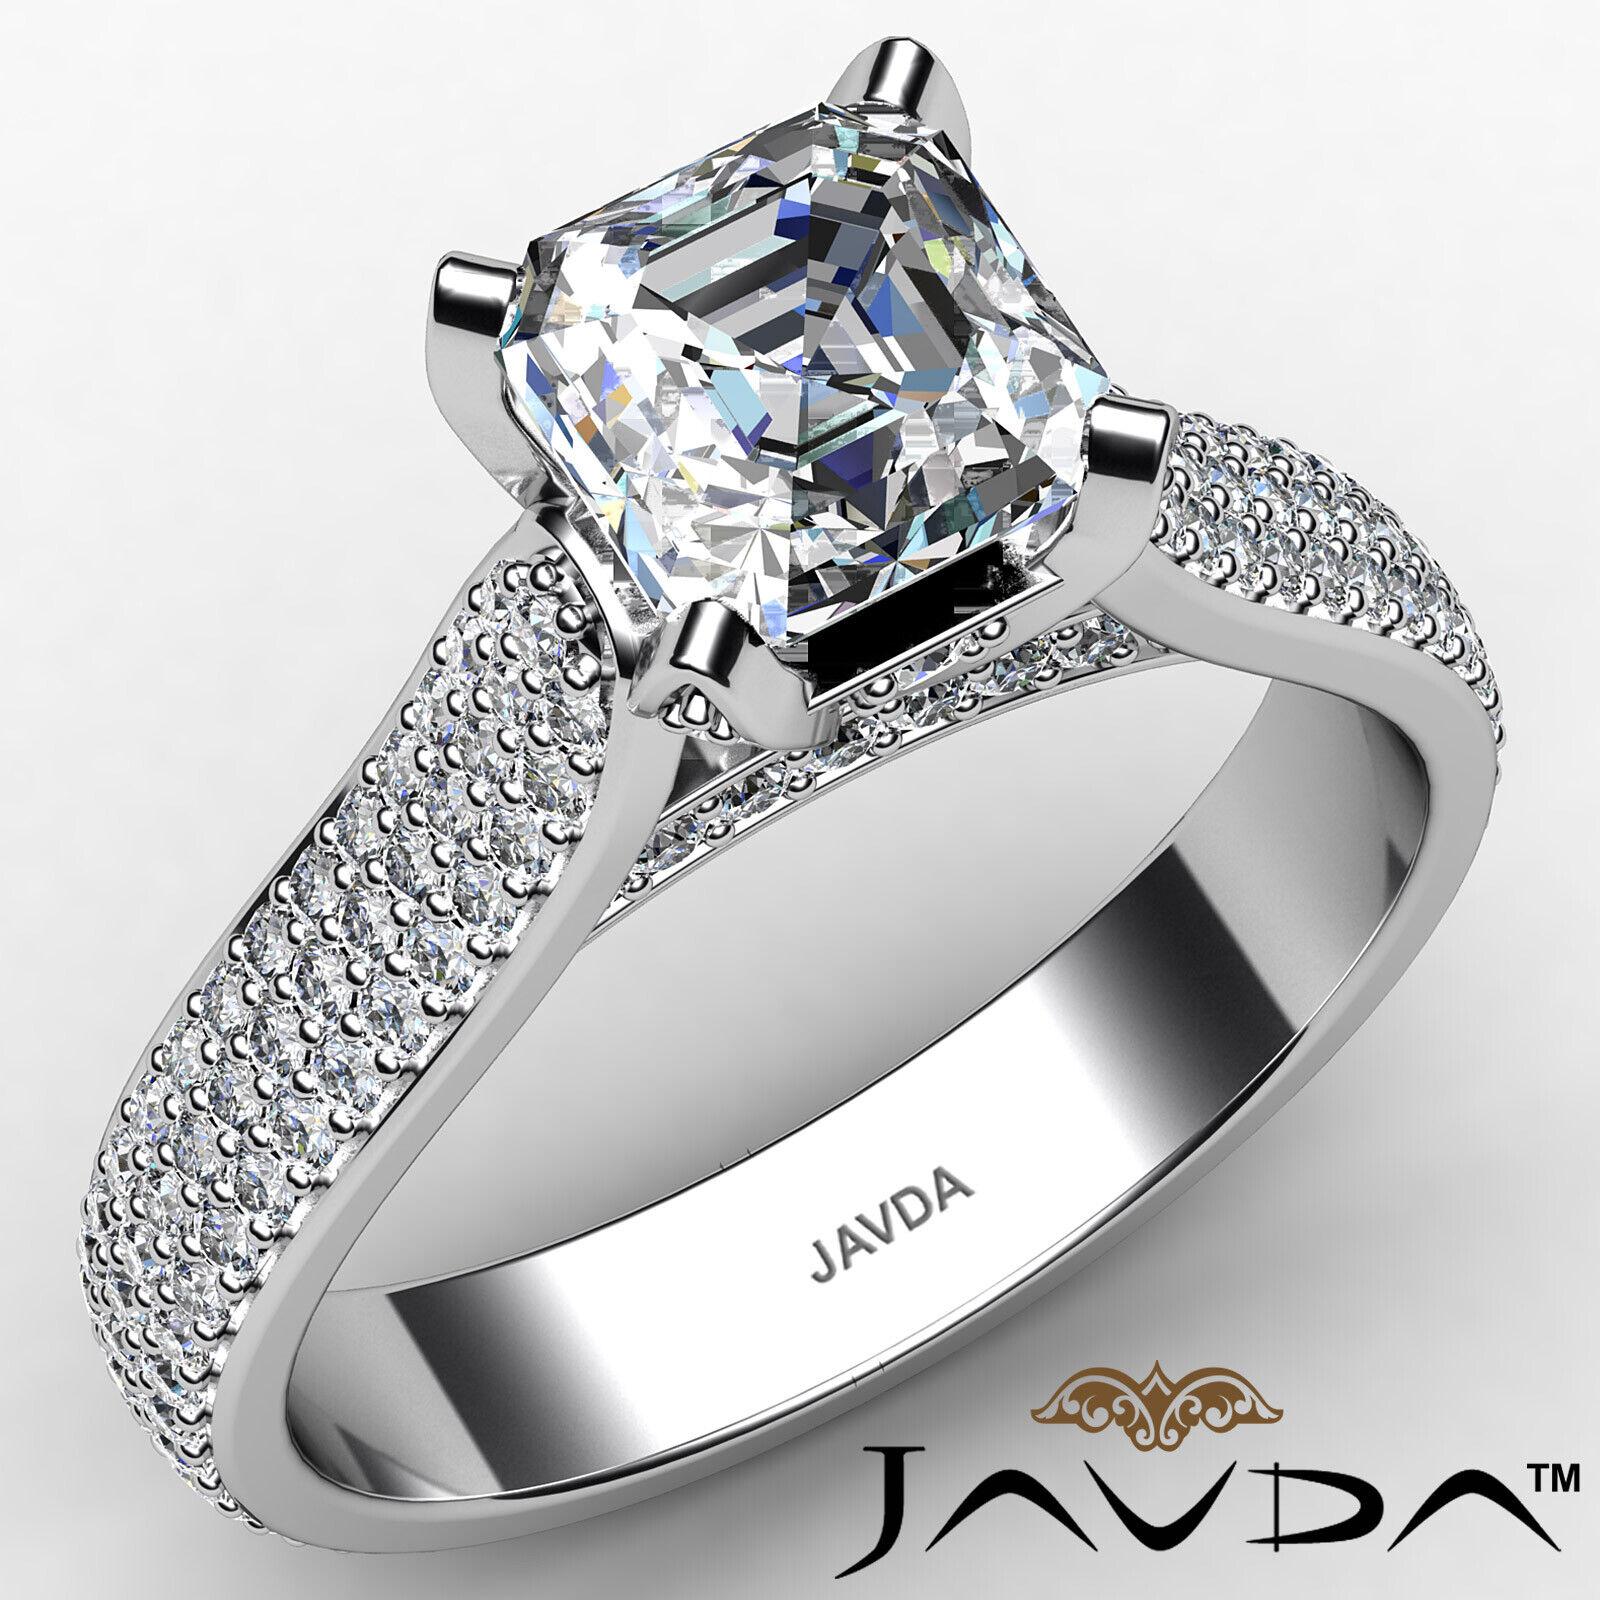 Asscher Diamond Engagement Lotus Basket Ring GIA I Color & VS1 clarity 2.18 ctw